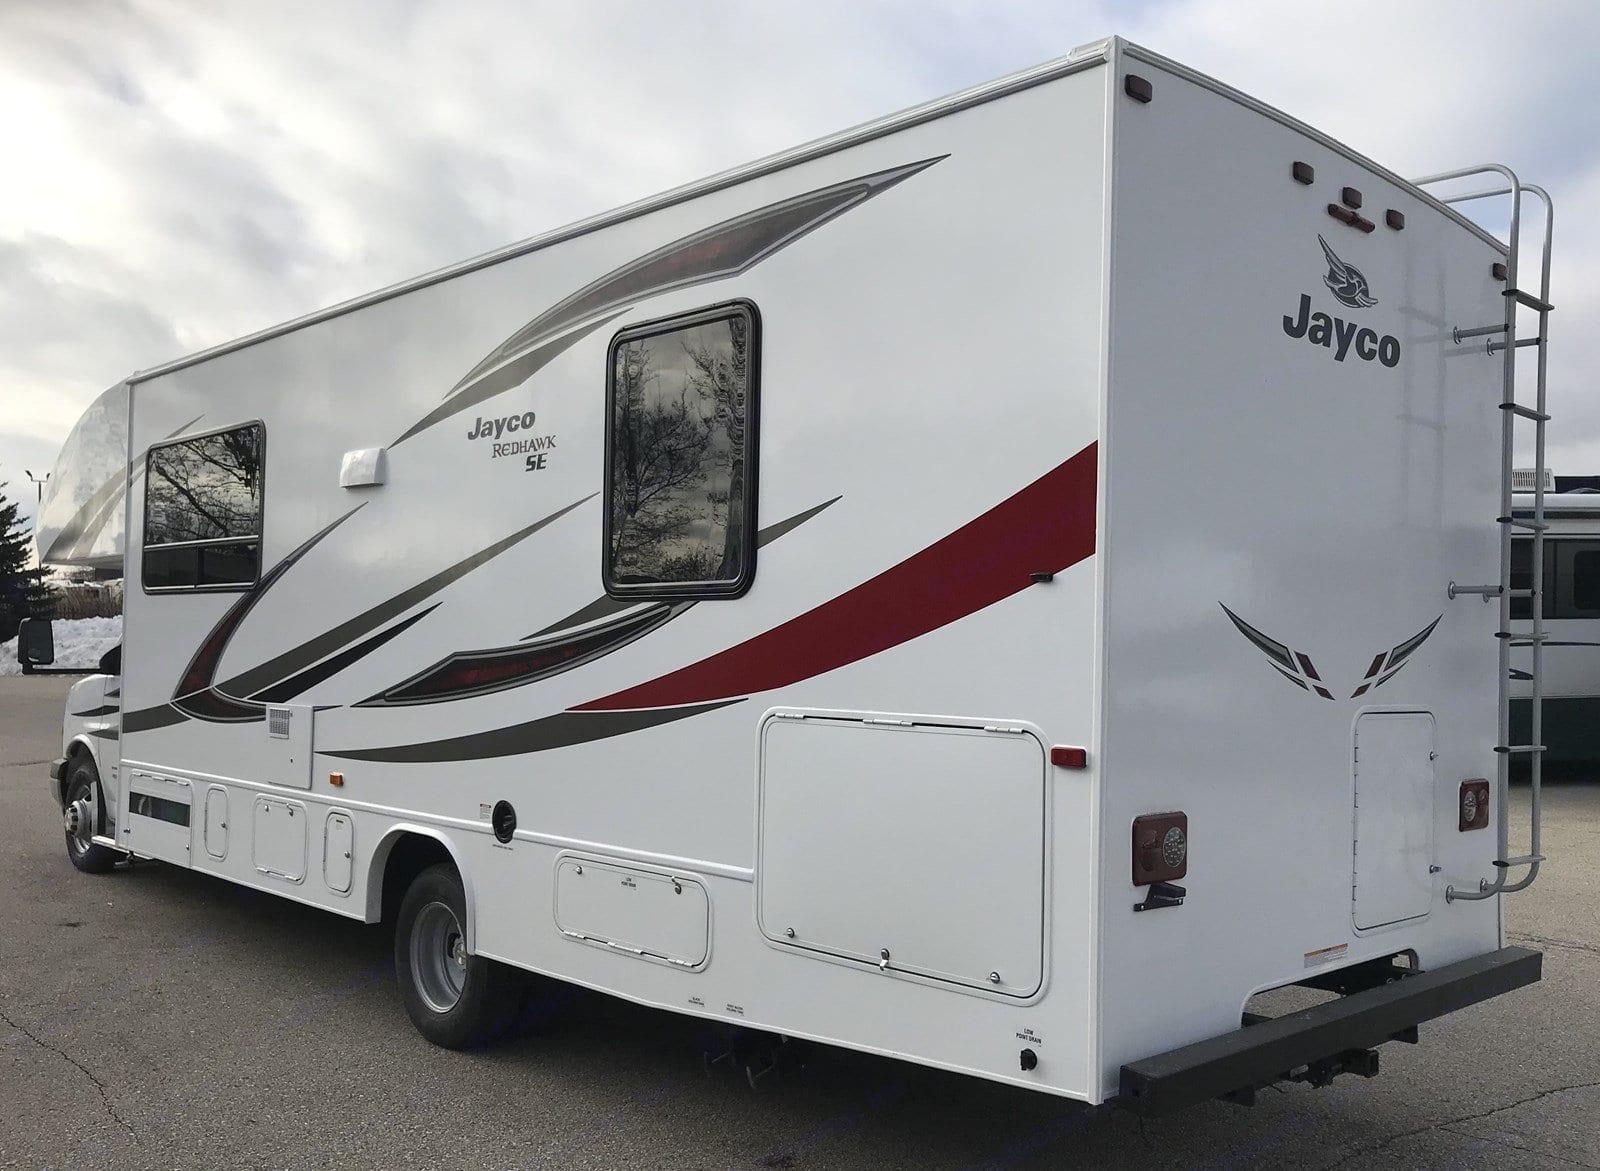 Jayco Redhawk SE 2019